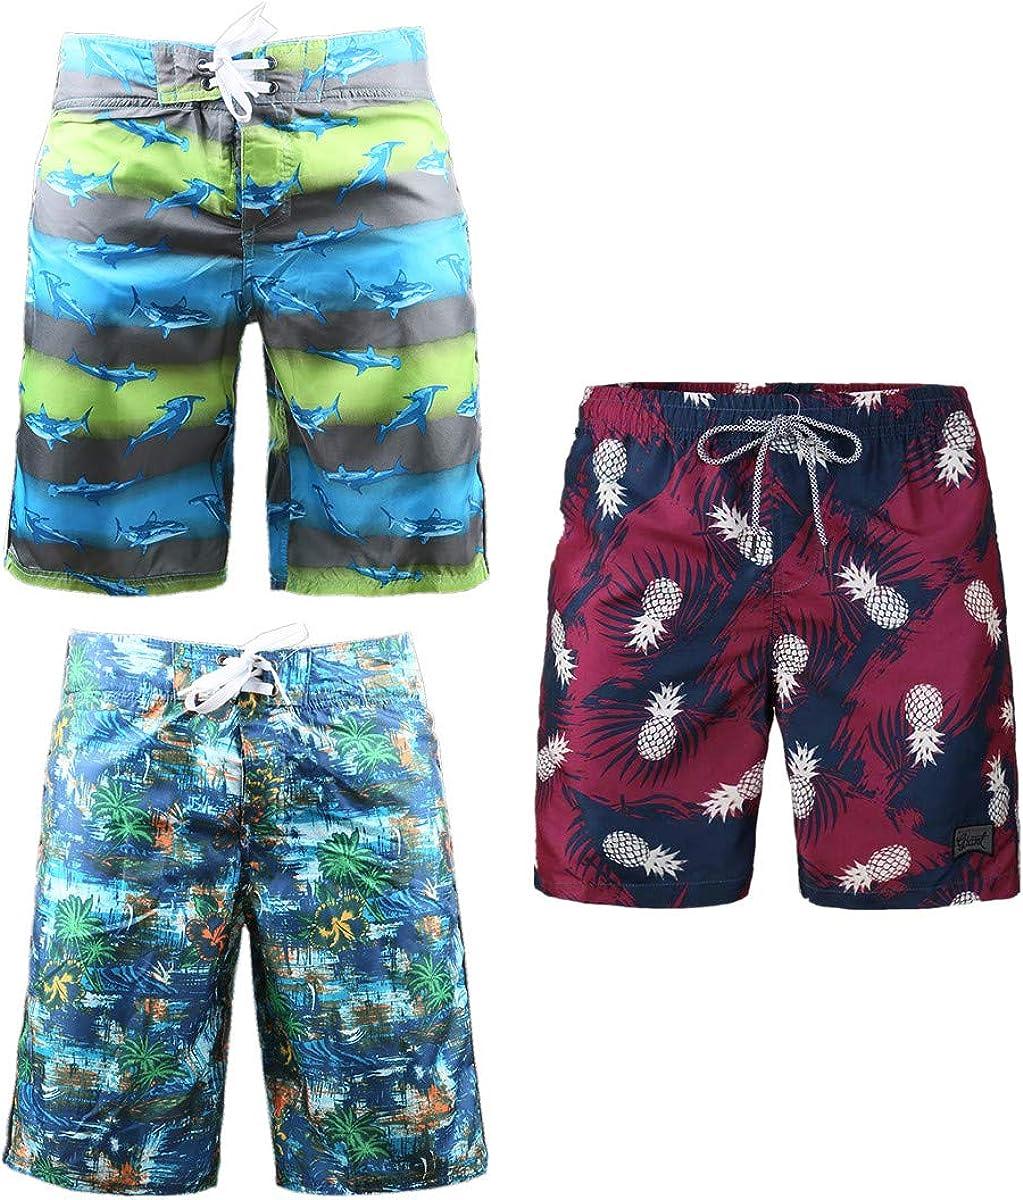 Beautiful Giant 3-Pack Men's Board Shorts Drawstring Summer Swimming Soft Comfy Breathable Swim Shorts